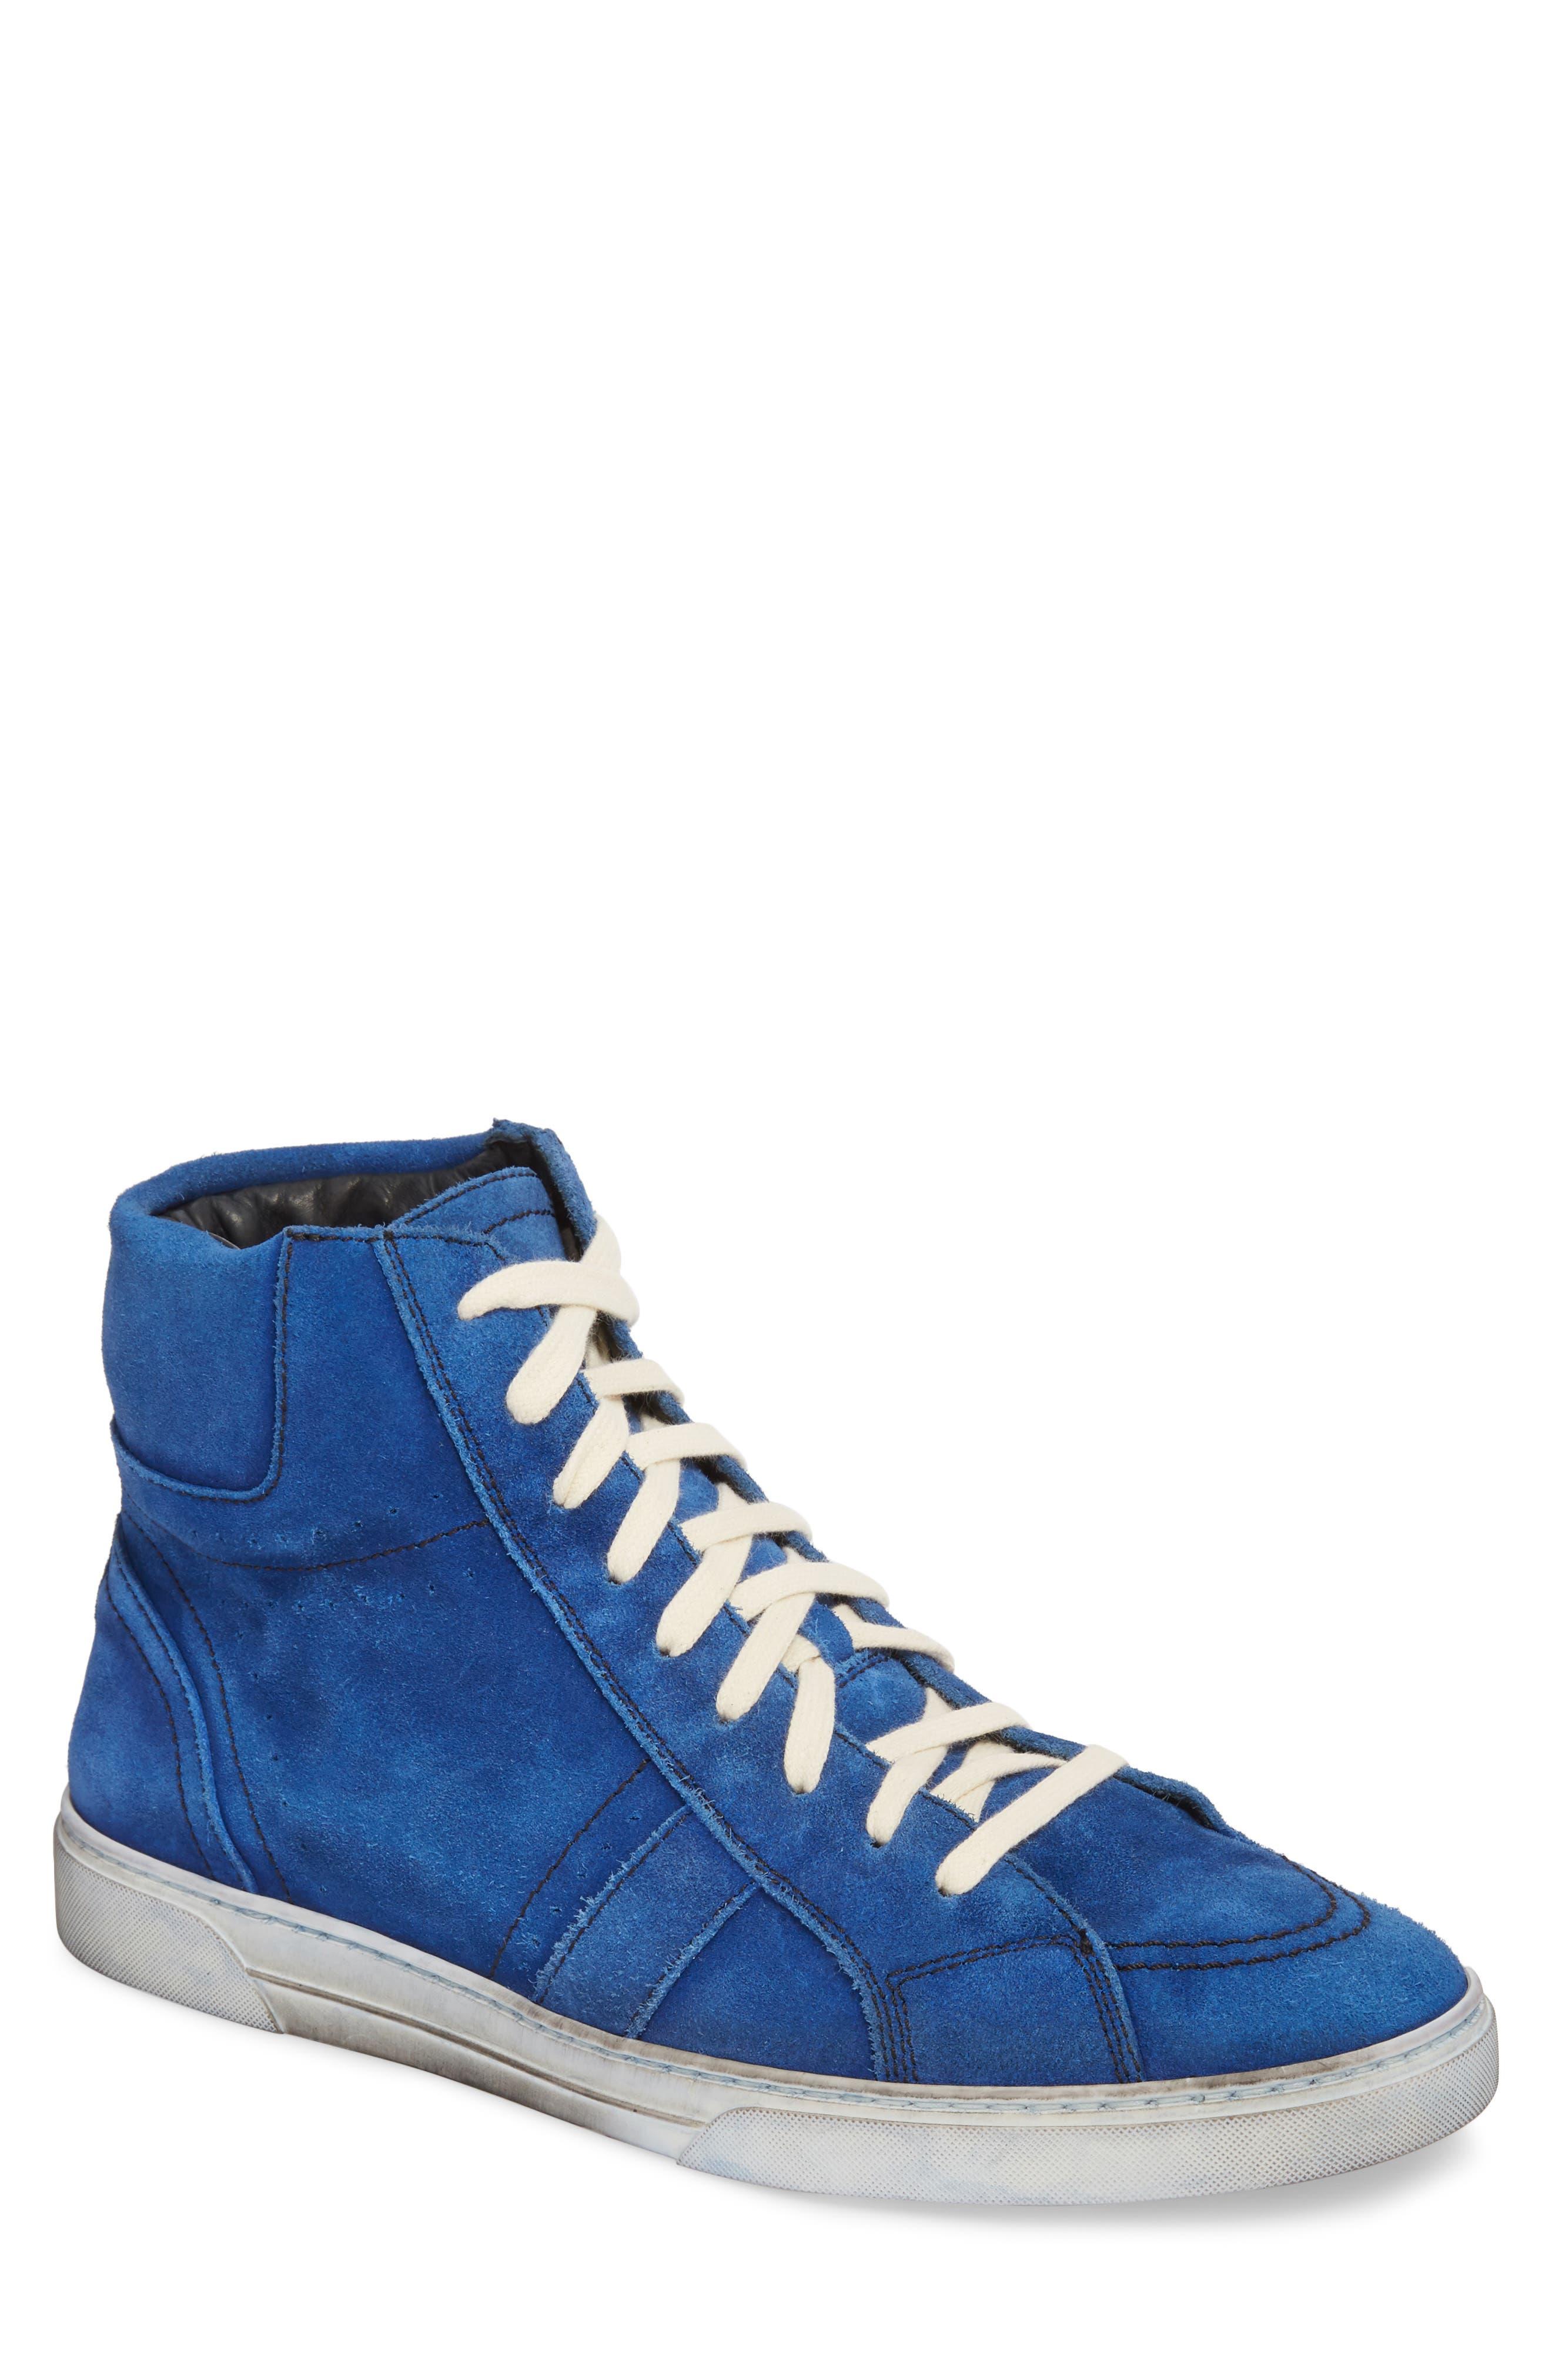 High Top Sneaker,                             Main thumbnail 1, color,                             400